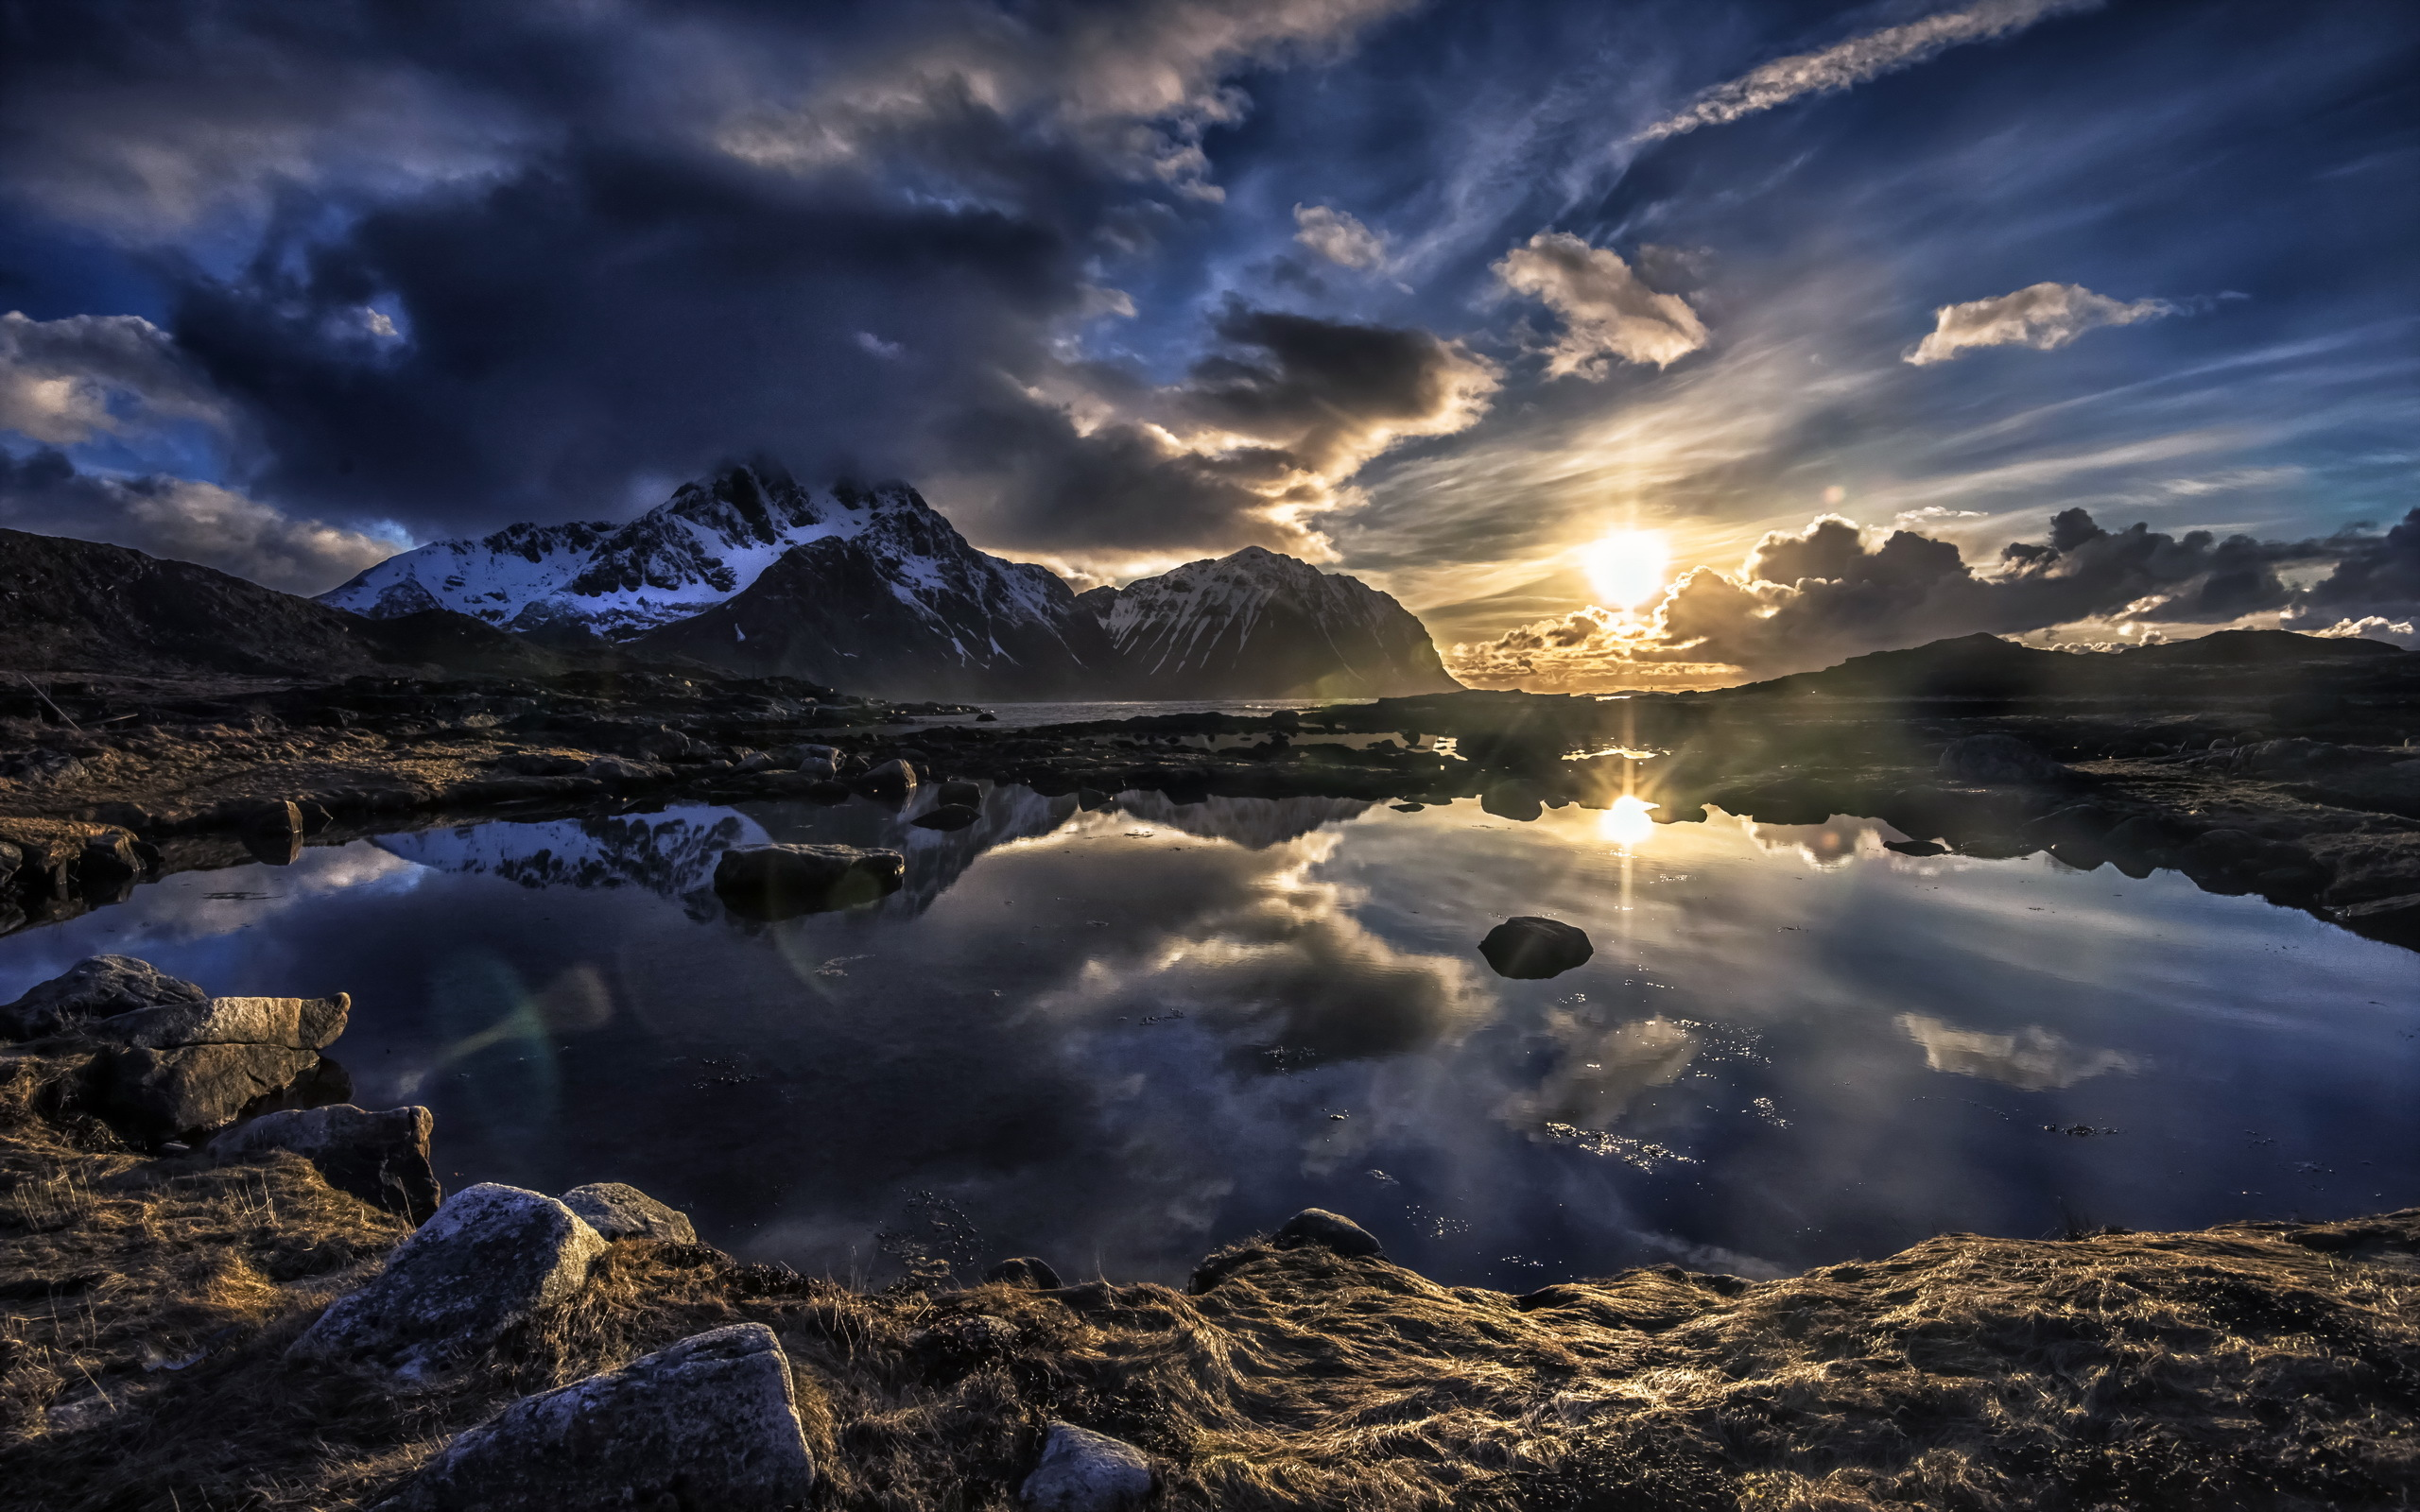 закат горы небо вода  № 1019690 бесплатно